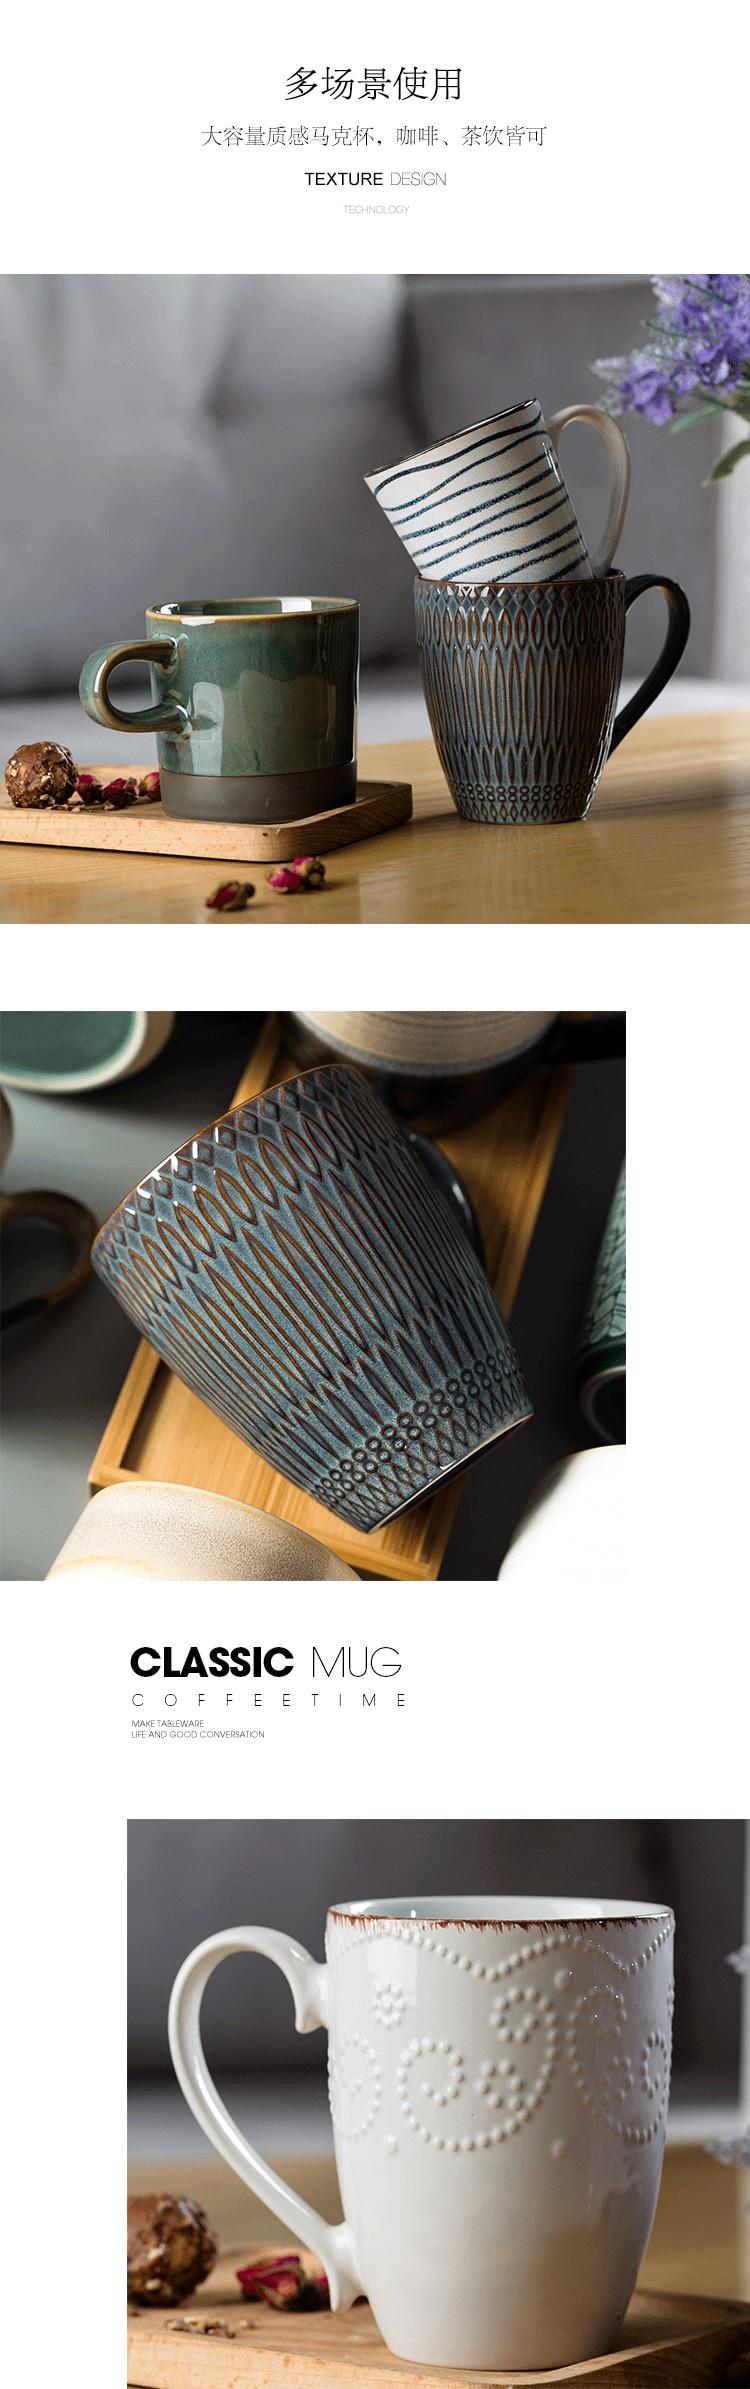 Vintage Coffee Cup Ceramic Mug Breakfast Milk Cup Home Office Tea Cup Travel Coffee Mug Funny Mug Coffee Mugs Creative